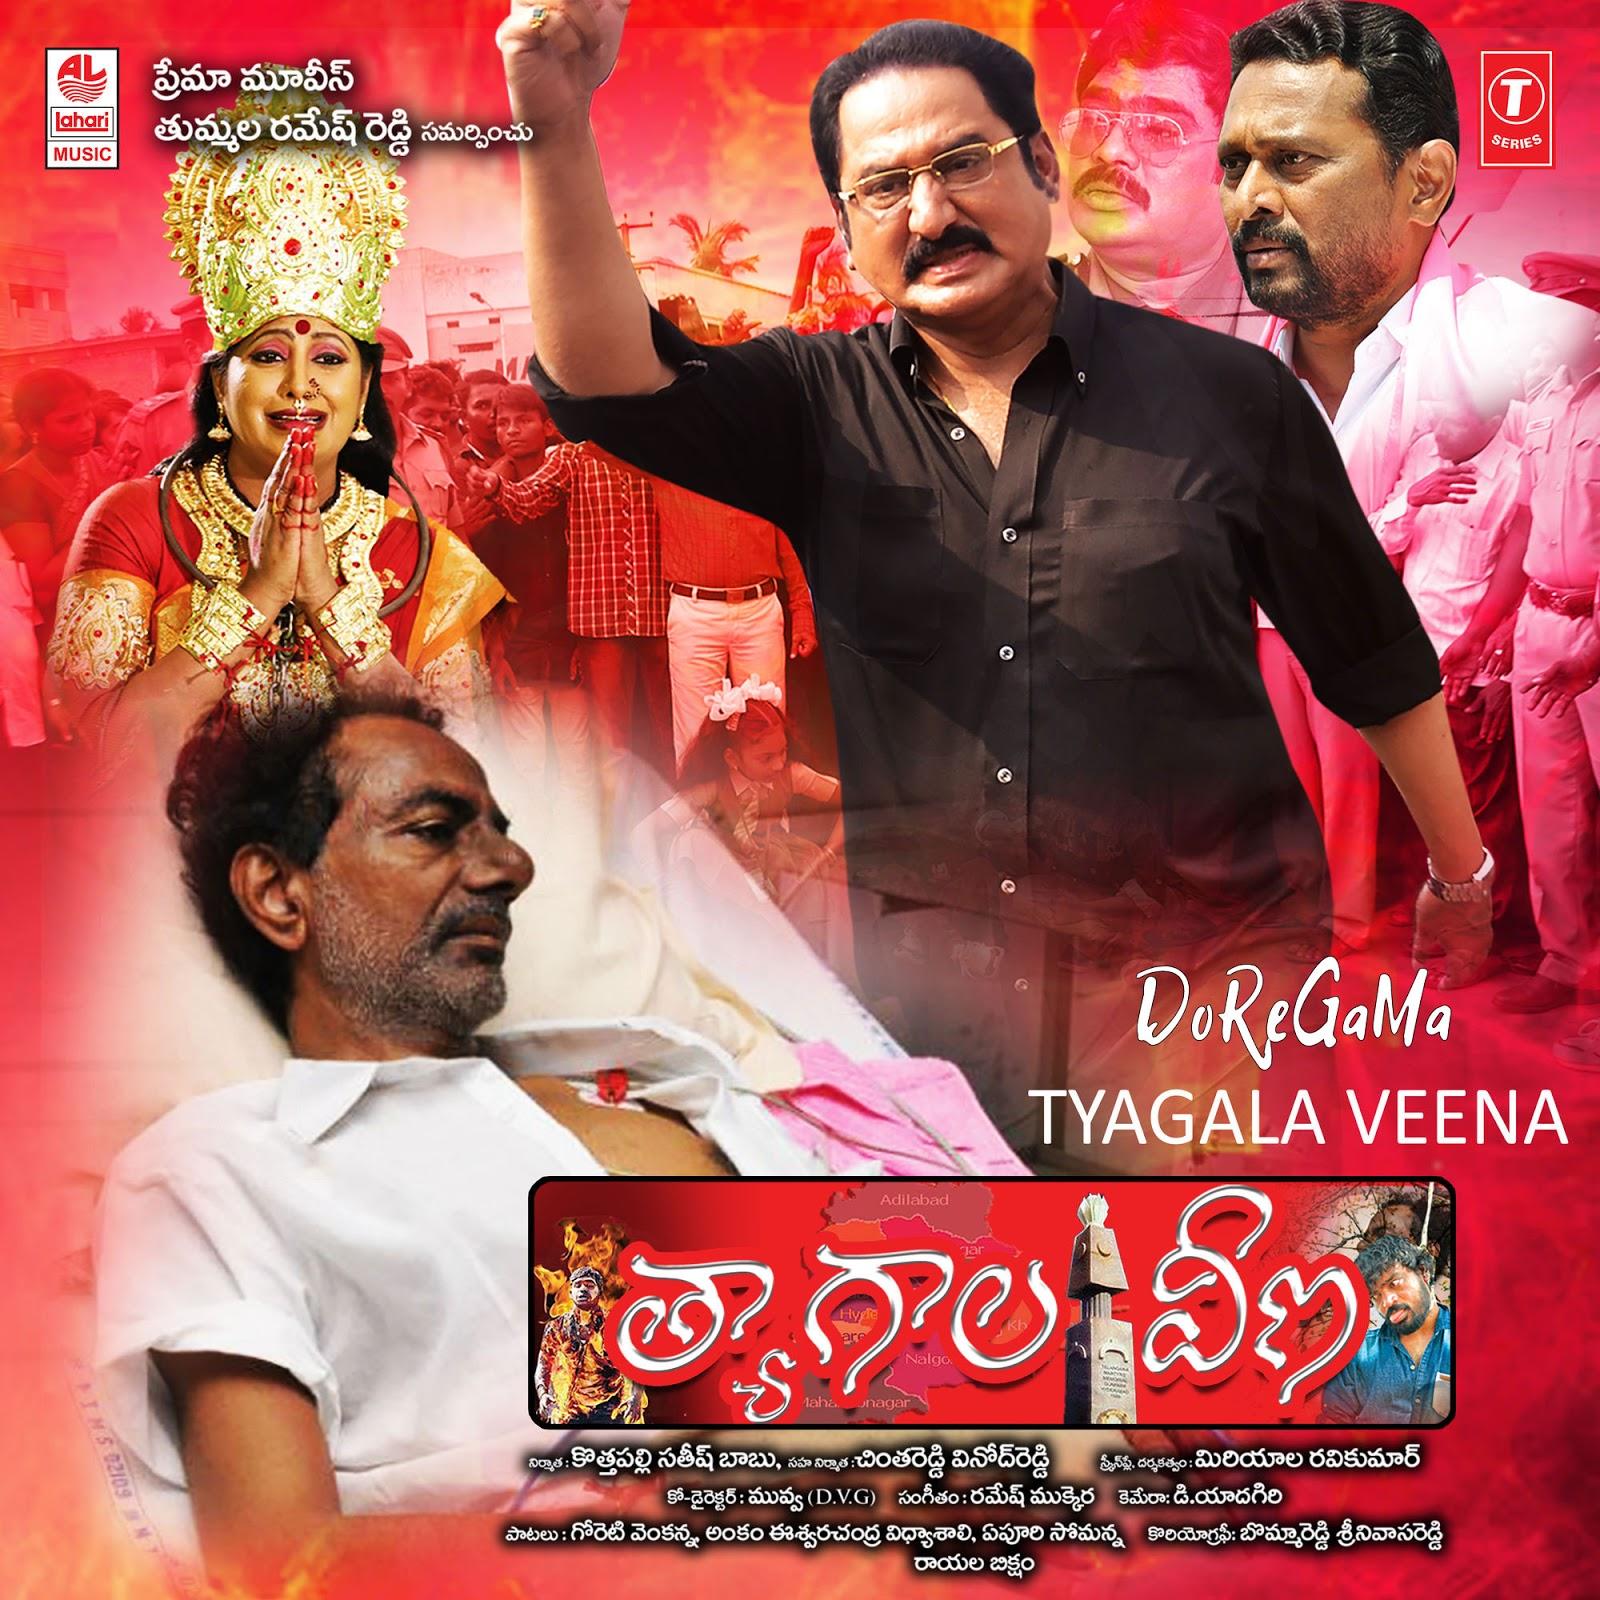 Tyagala-Veena-2016-Original-CD-Front-Cover-Poster-wallpaper